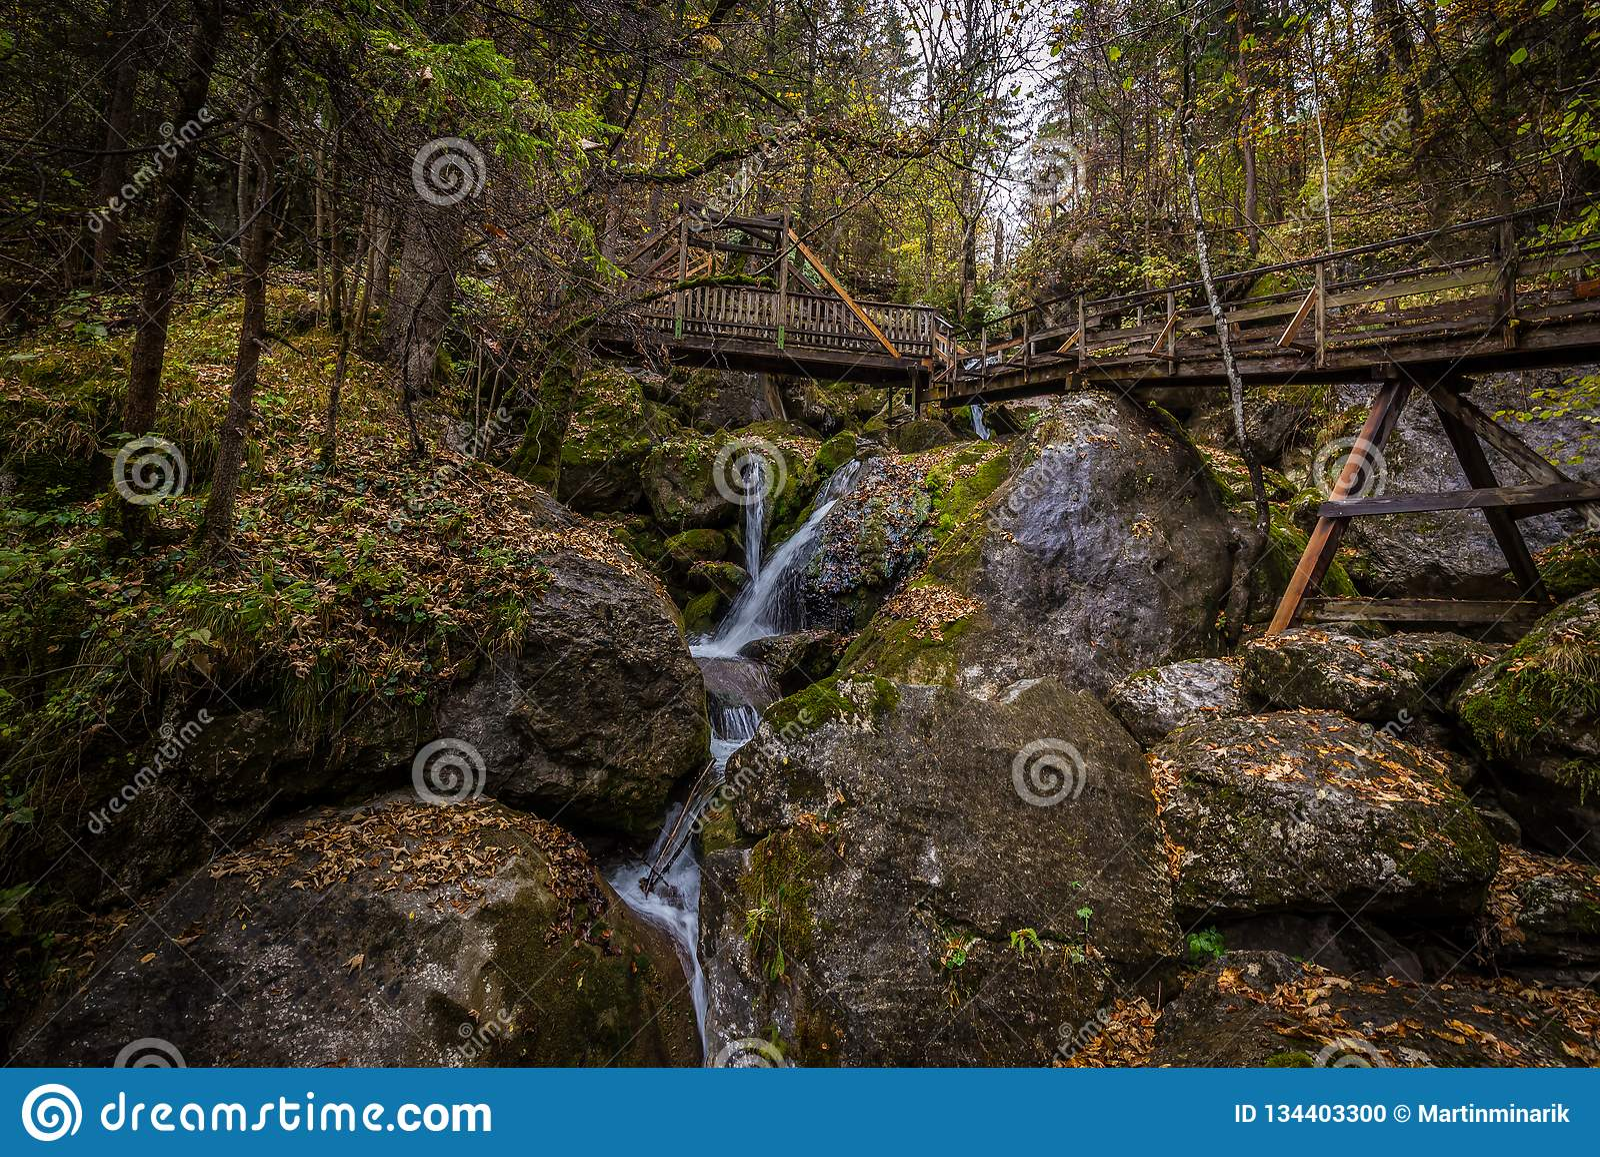 Kaskaden über moosige Felsen mit Holzbrücke über dem Wasserfall im bunten Herbstwald